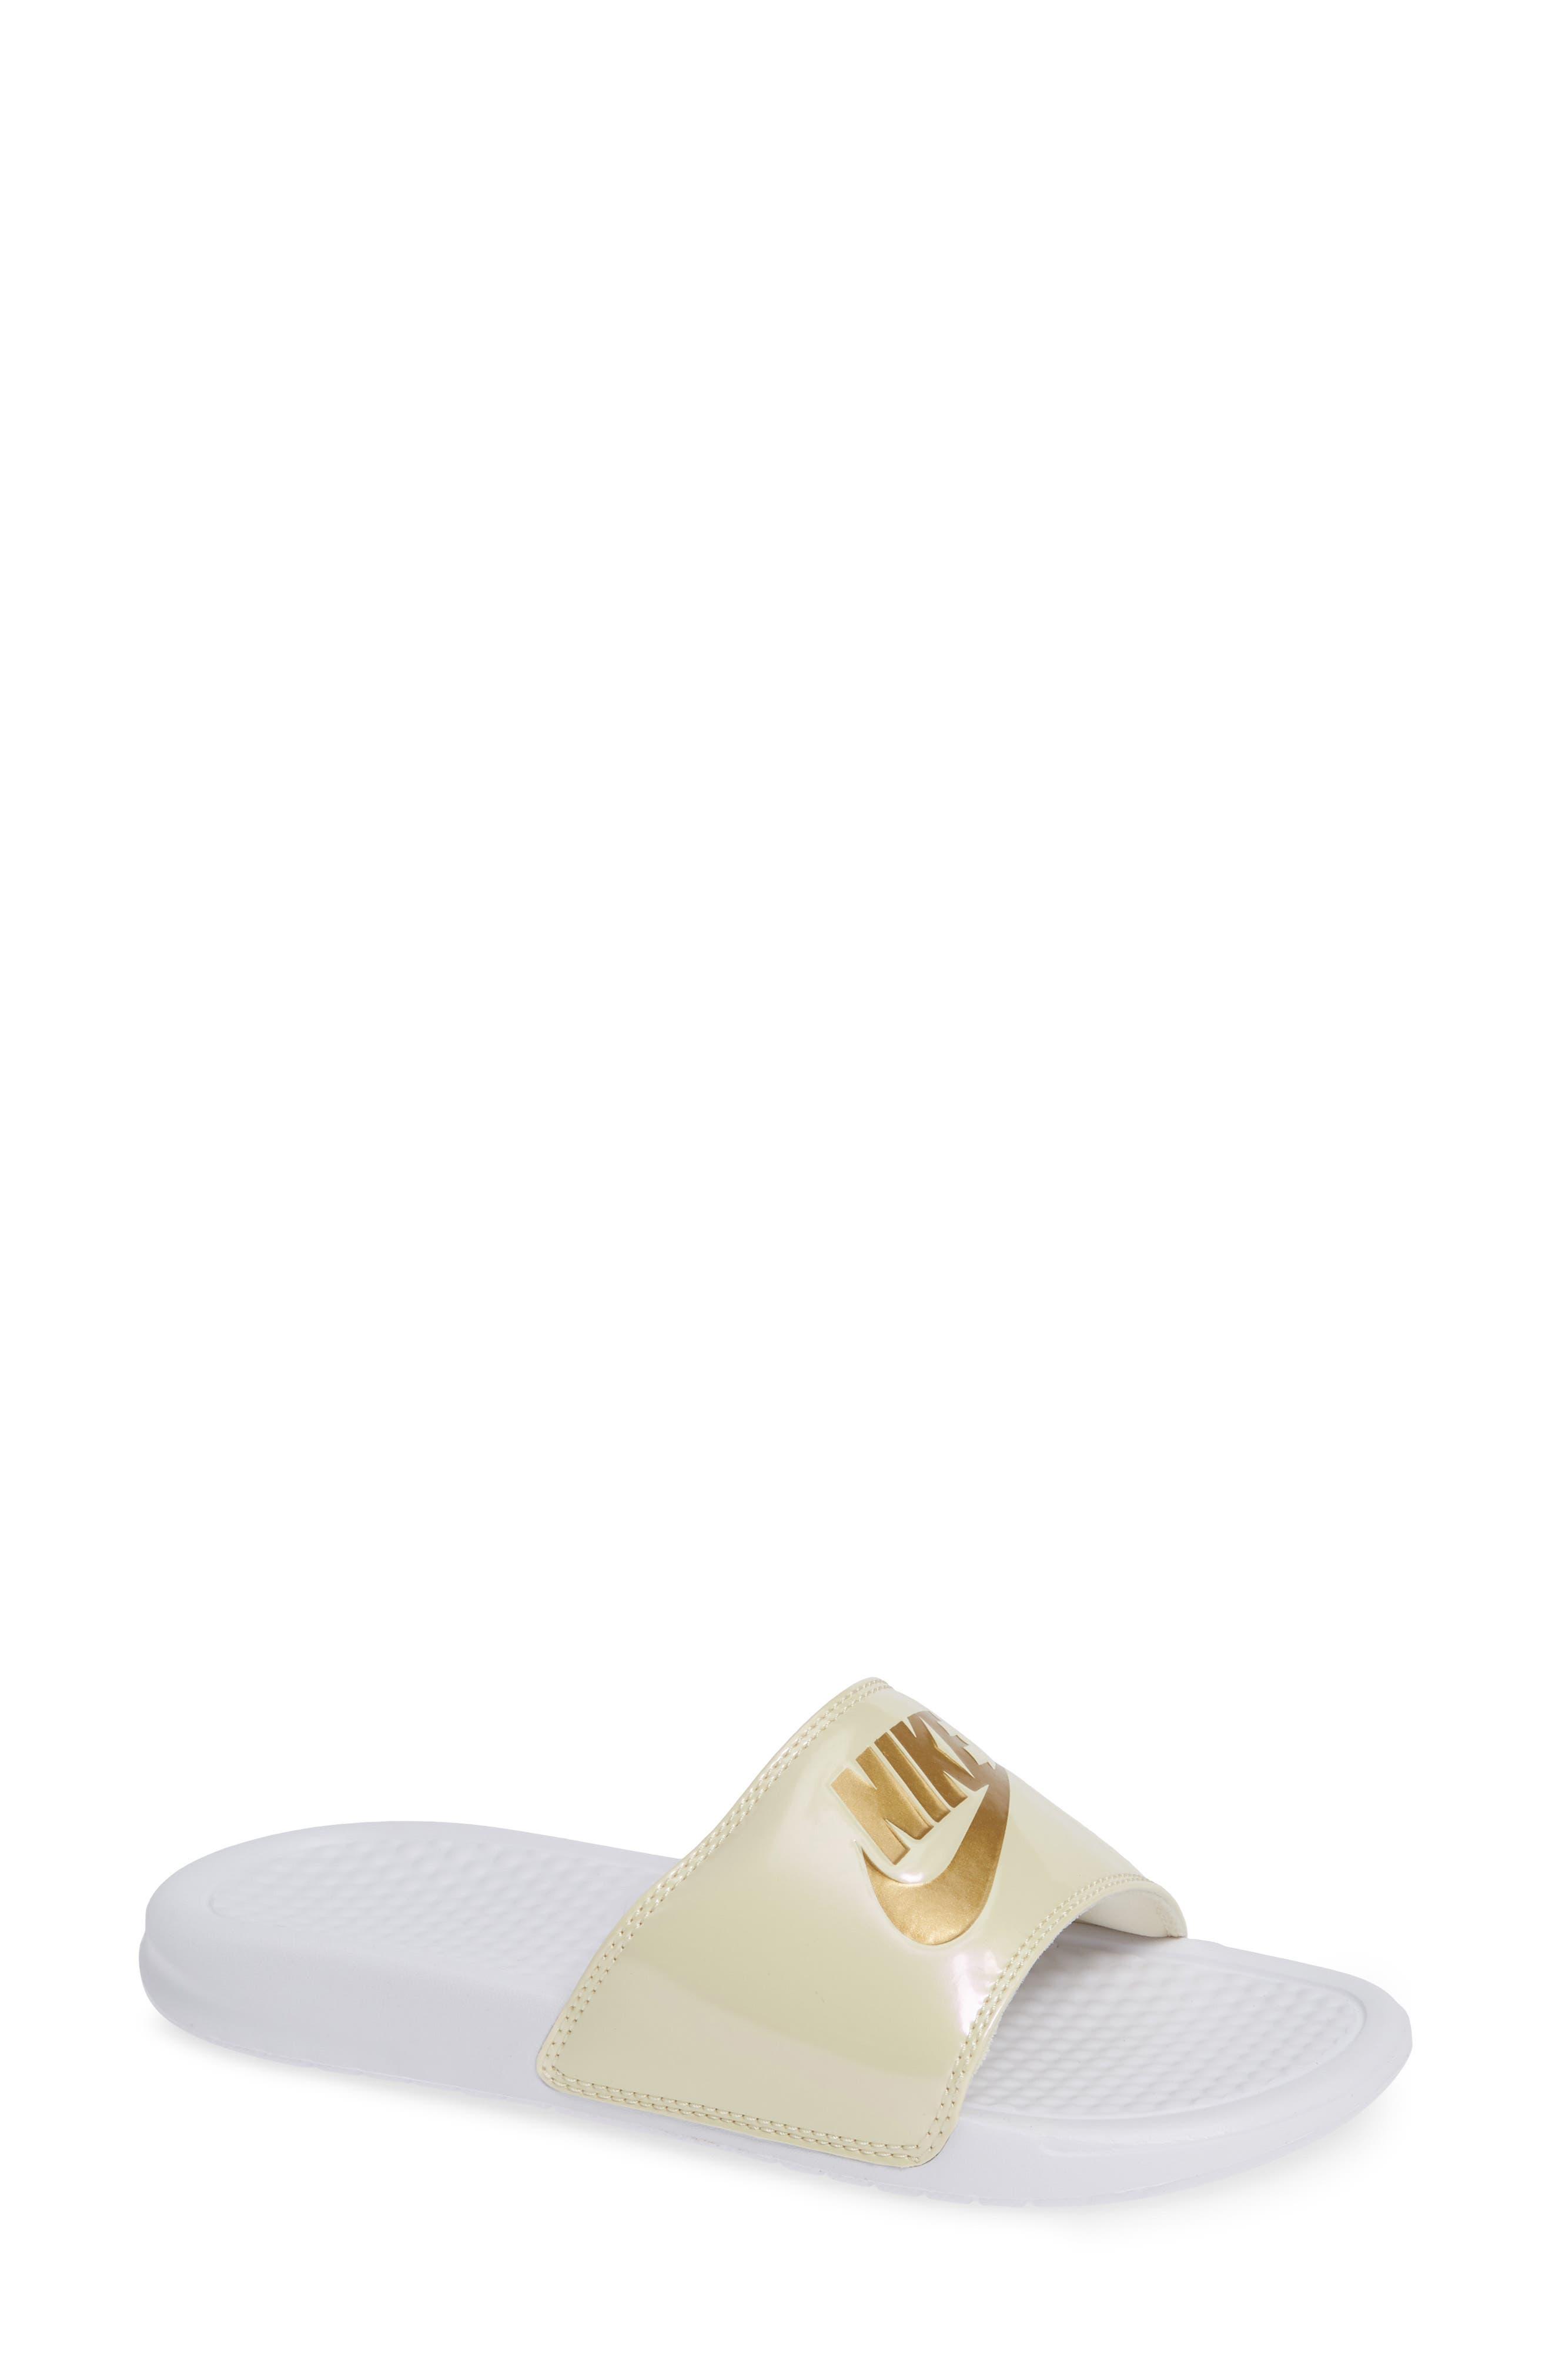 Benassi Just Do It Print Sandal,                         Main,                         color, WHITE/ METALLIC GOLD/ BEACH